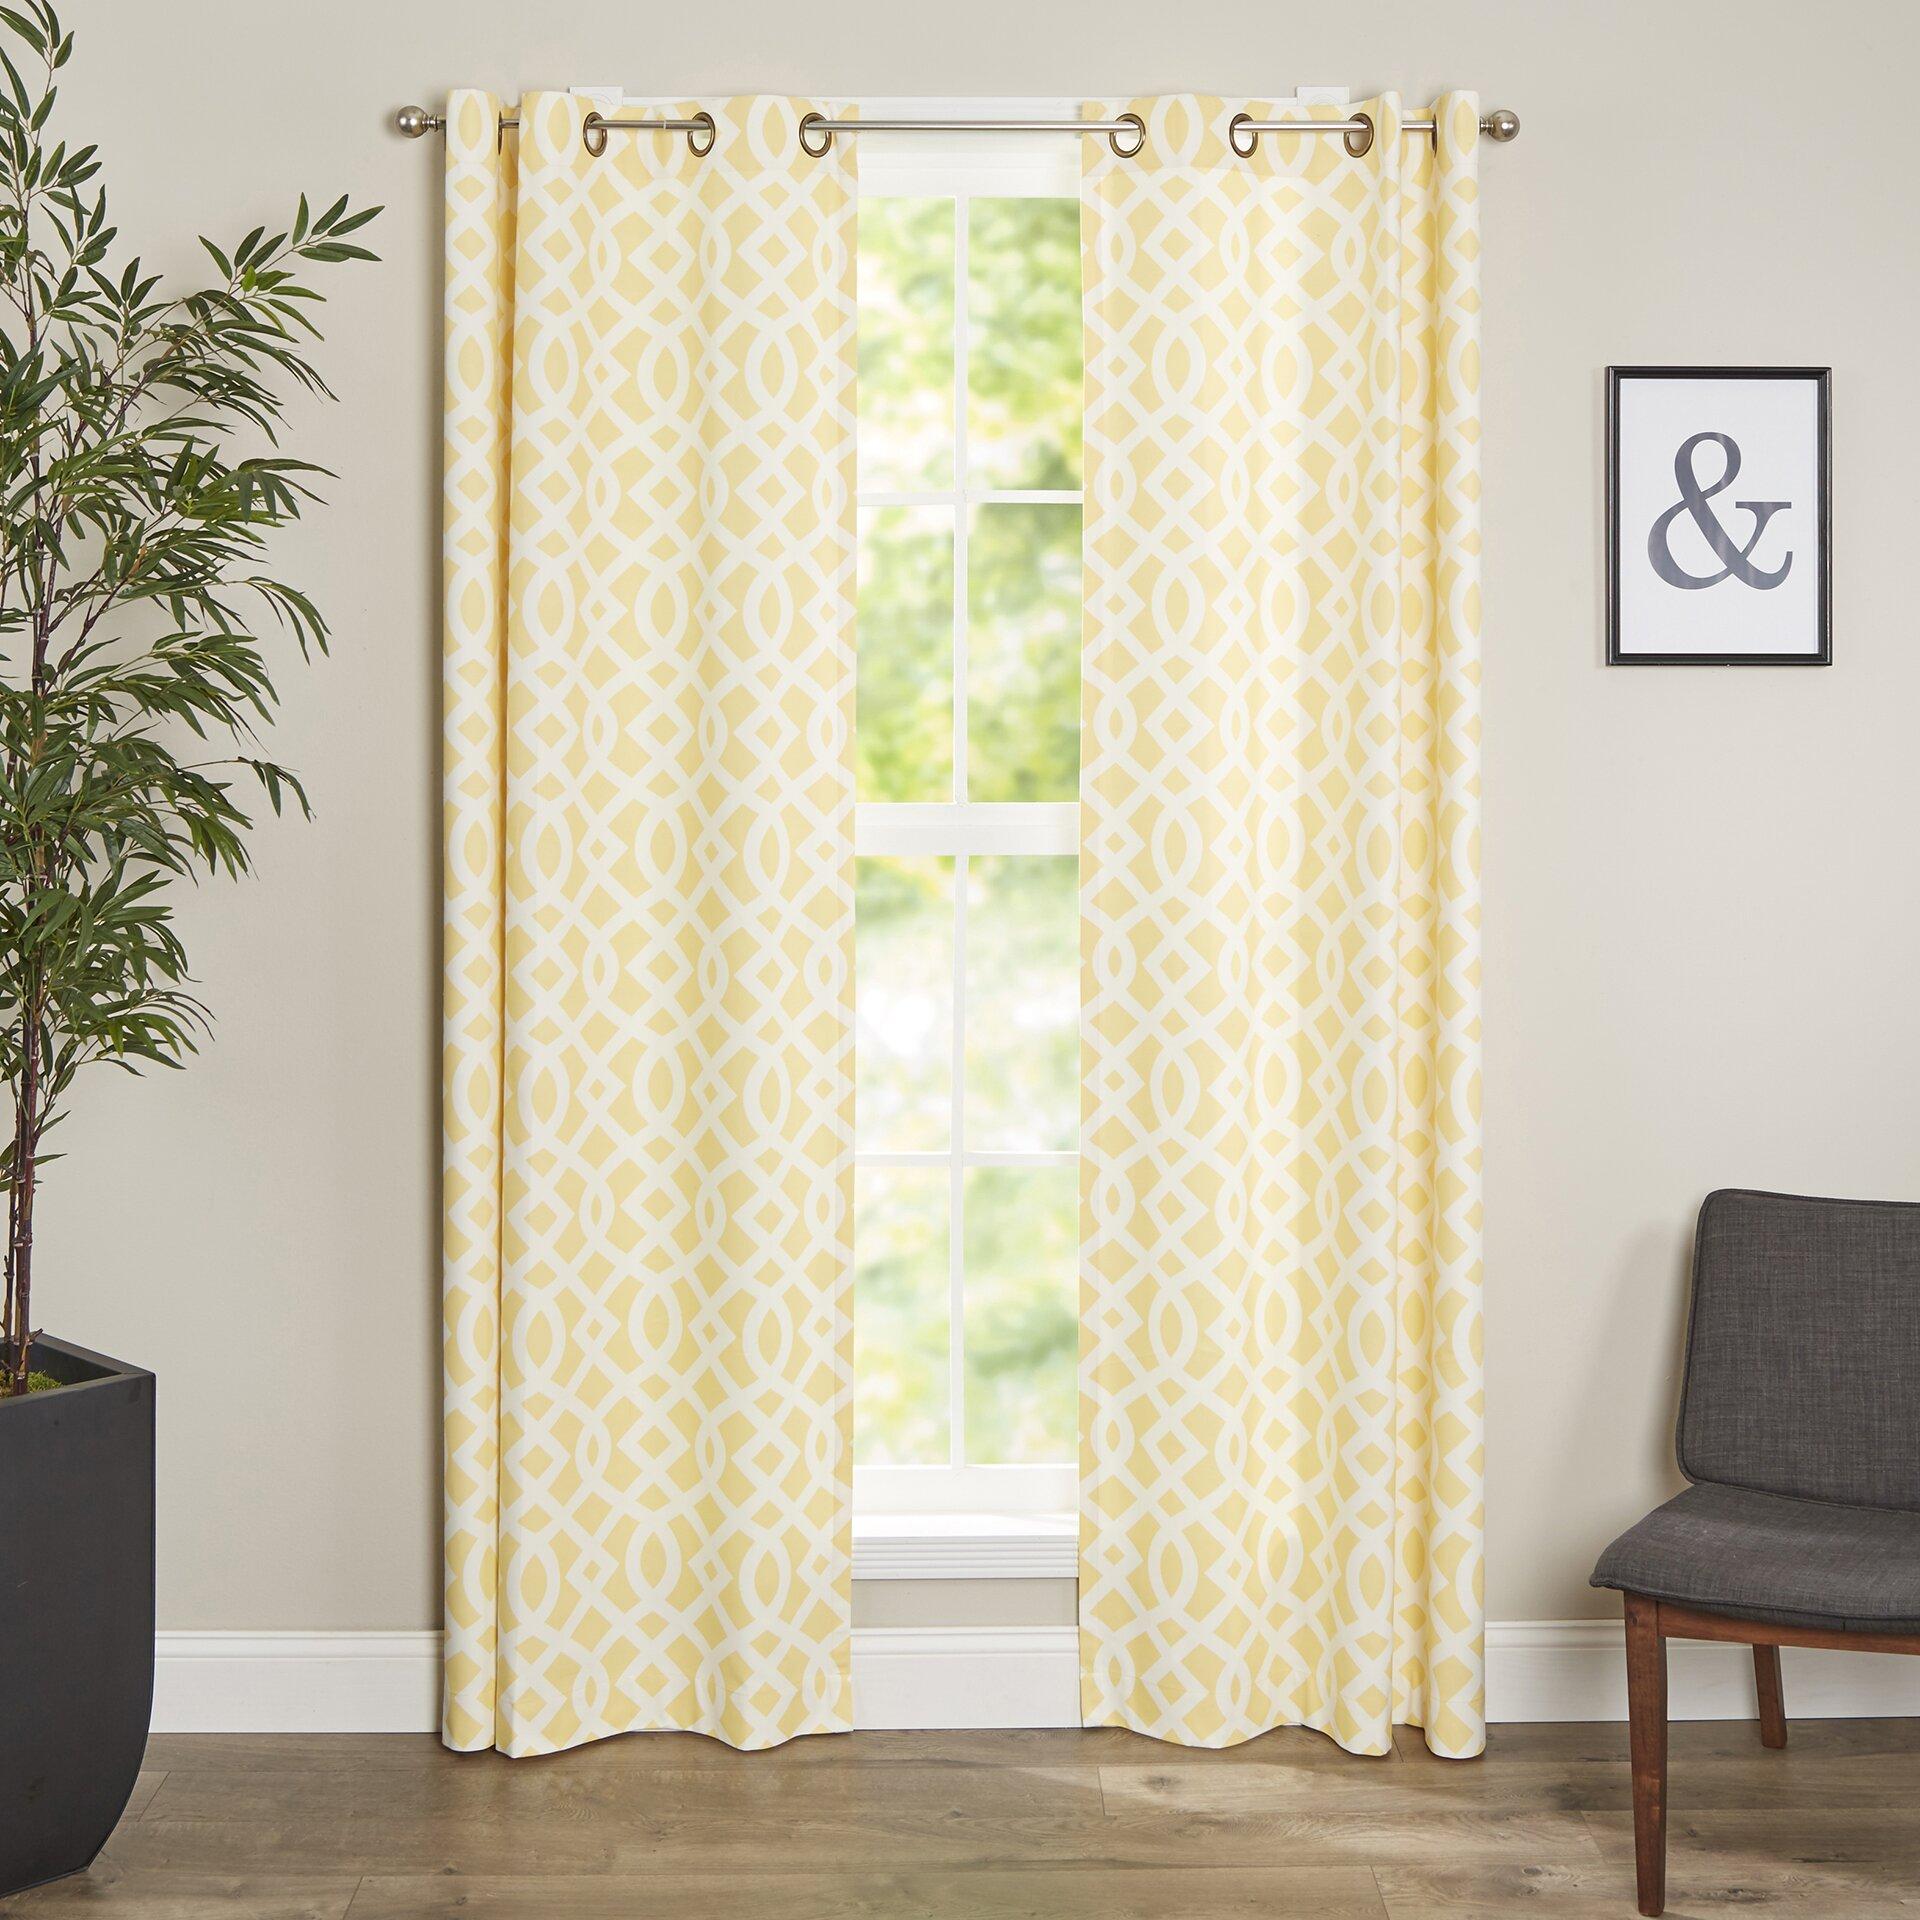 Aries Geometric Semi-Sheer Grommet Curtain Panels